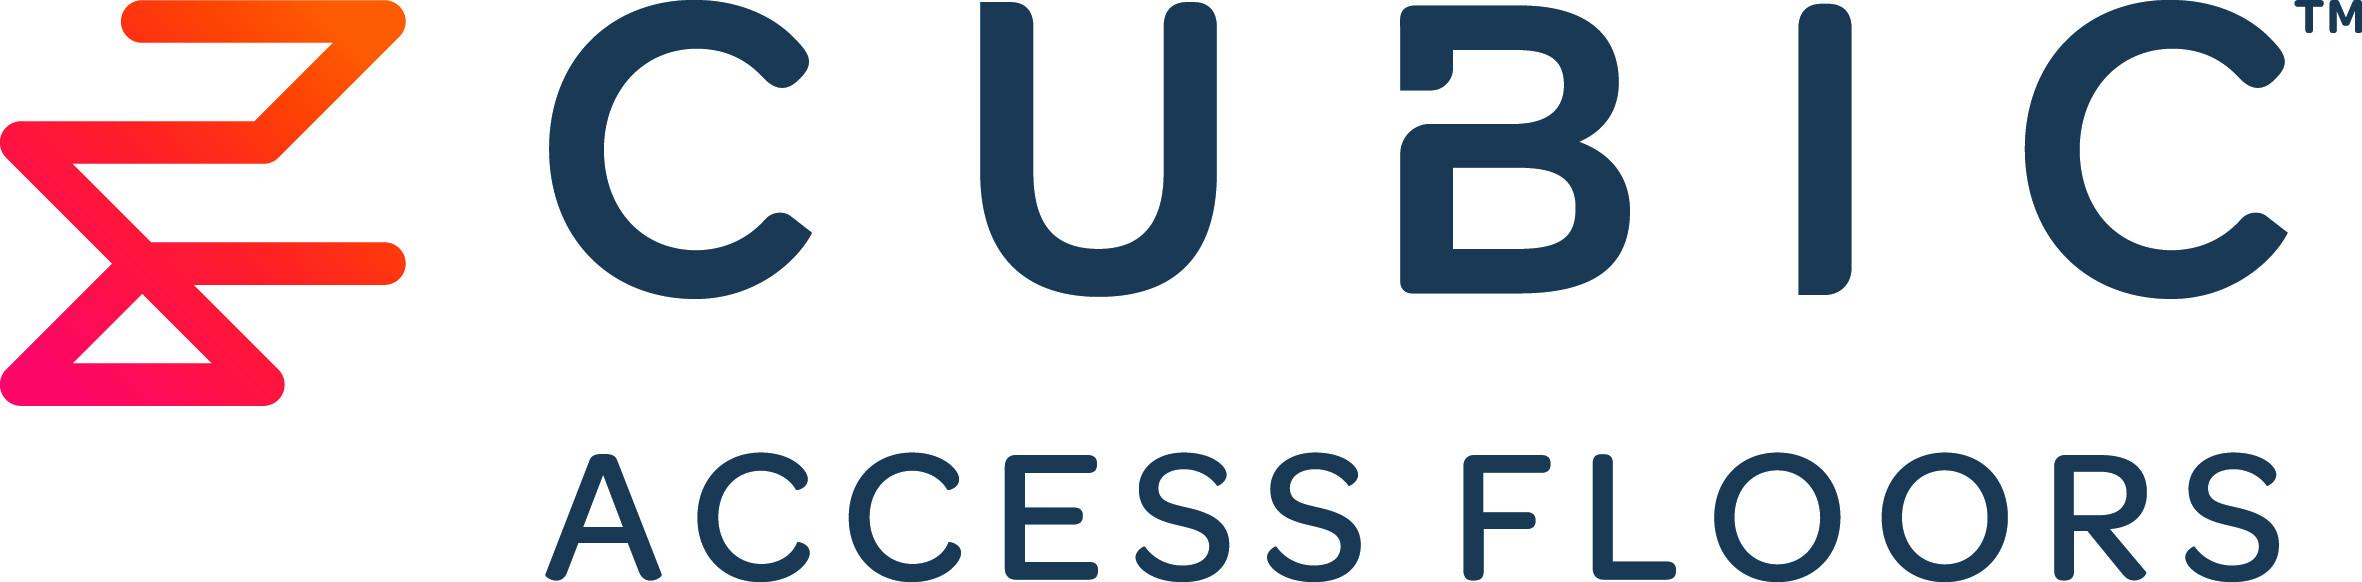 Cubic Access Floors